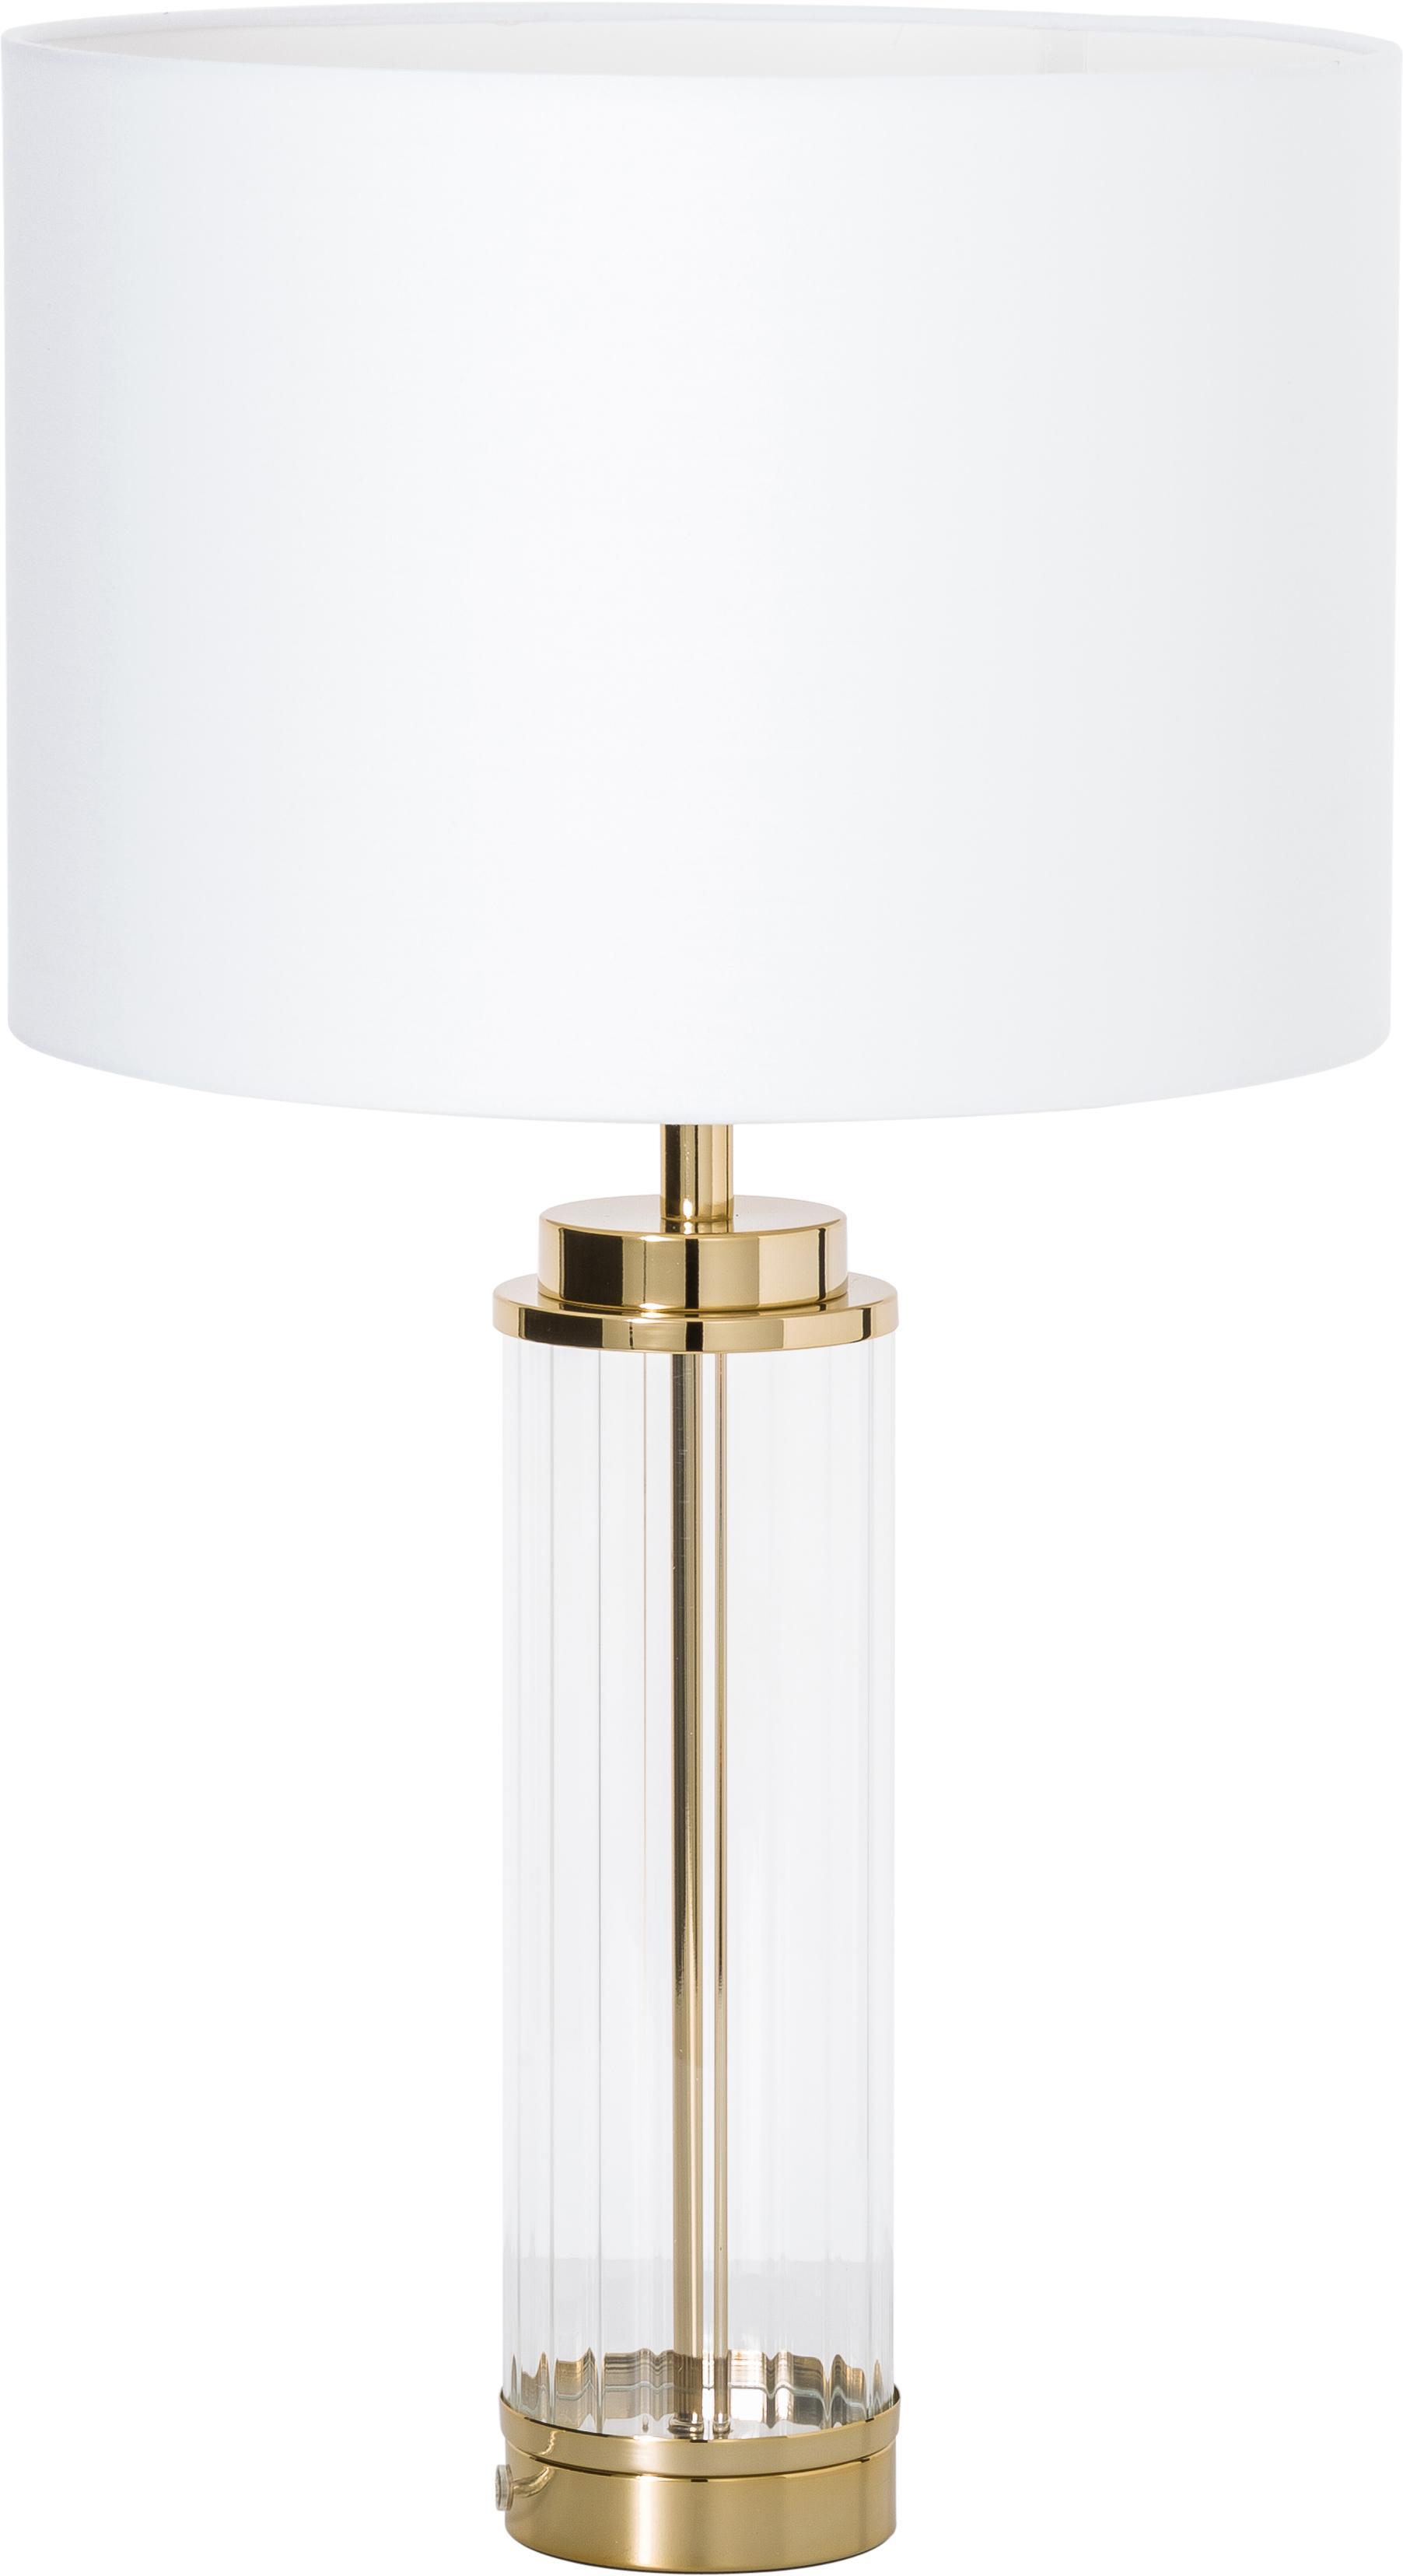 Grote glamoureuze tafellamp Gabor met glazen voet, Lampenkap: textiel, Lampvoet: metaal, glas, Lampenkap: crèmekleurig. Lampvoet: goudkleurig, Ø 35 x H 64 cm